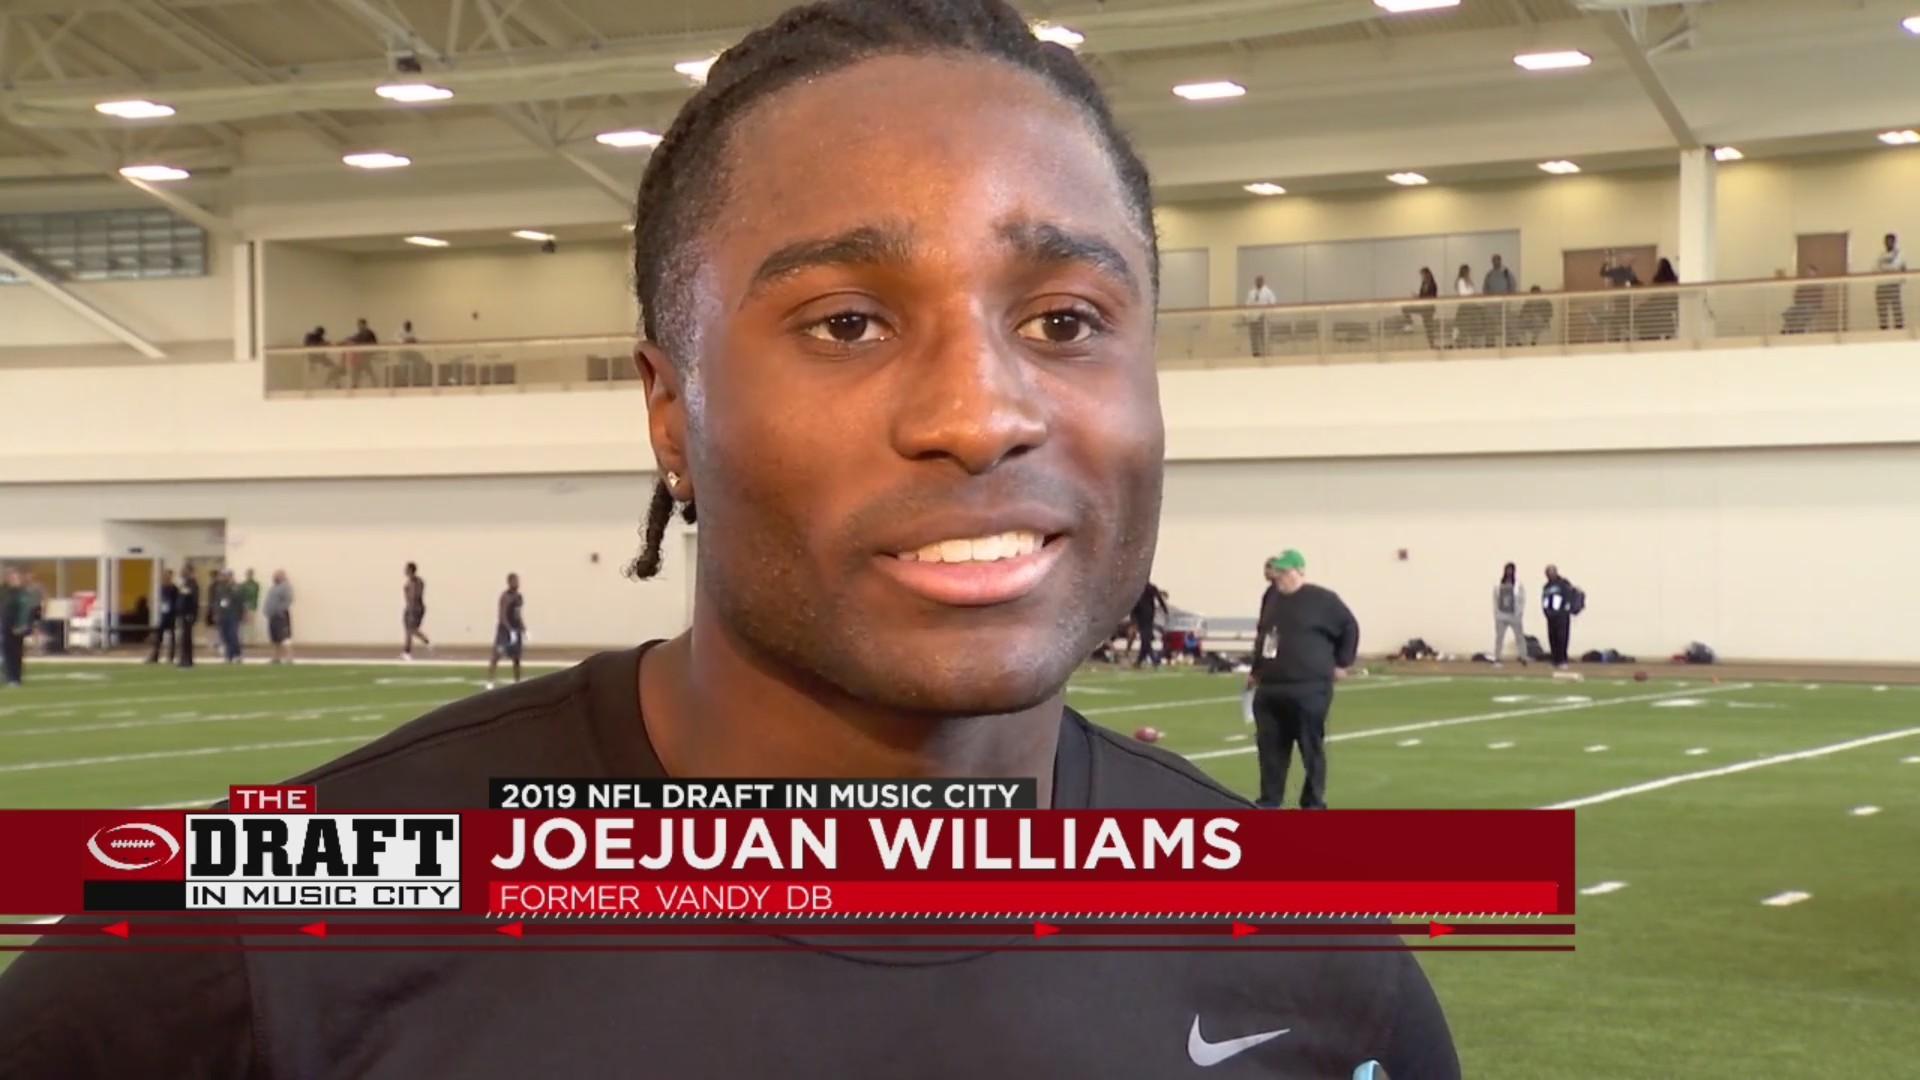 JoeJuan_Williams__draft_prospect_0_20190416221353